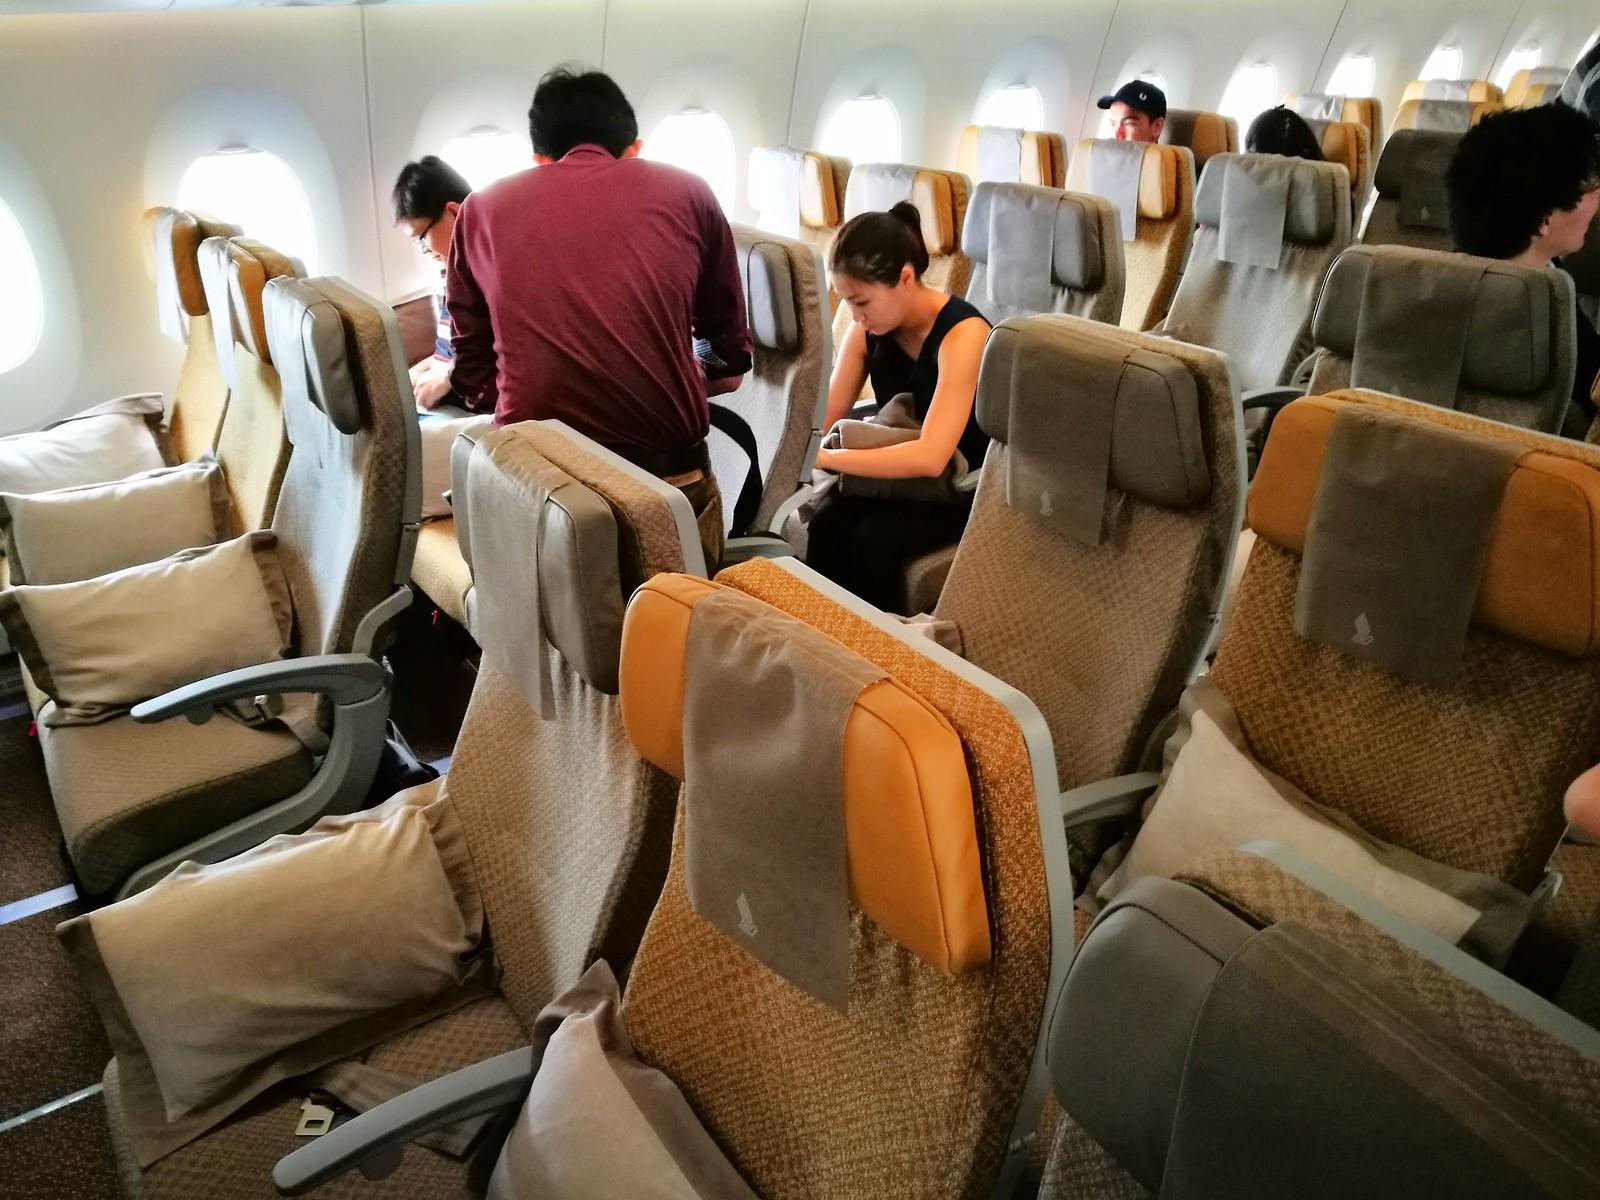 Second Economy class cabin